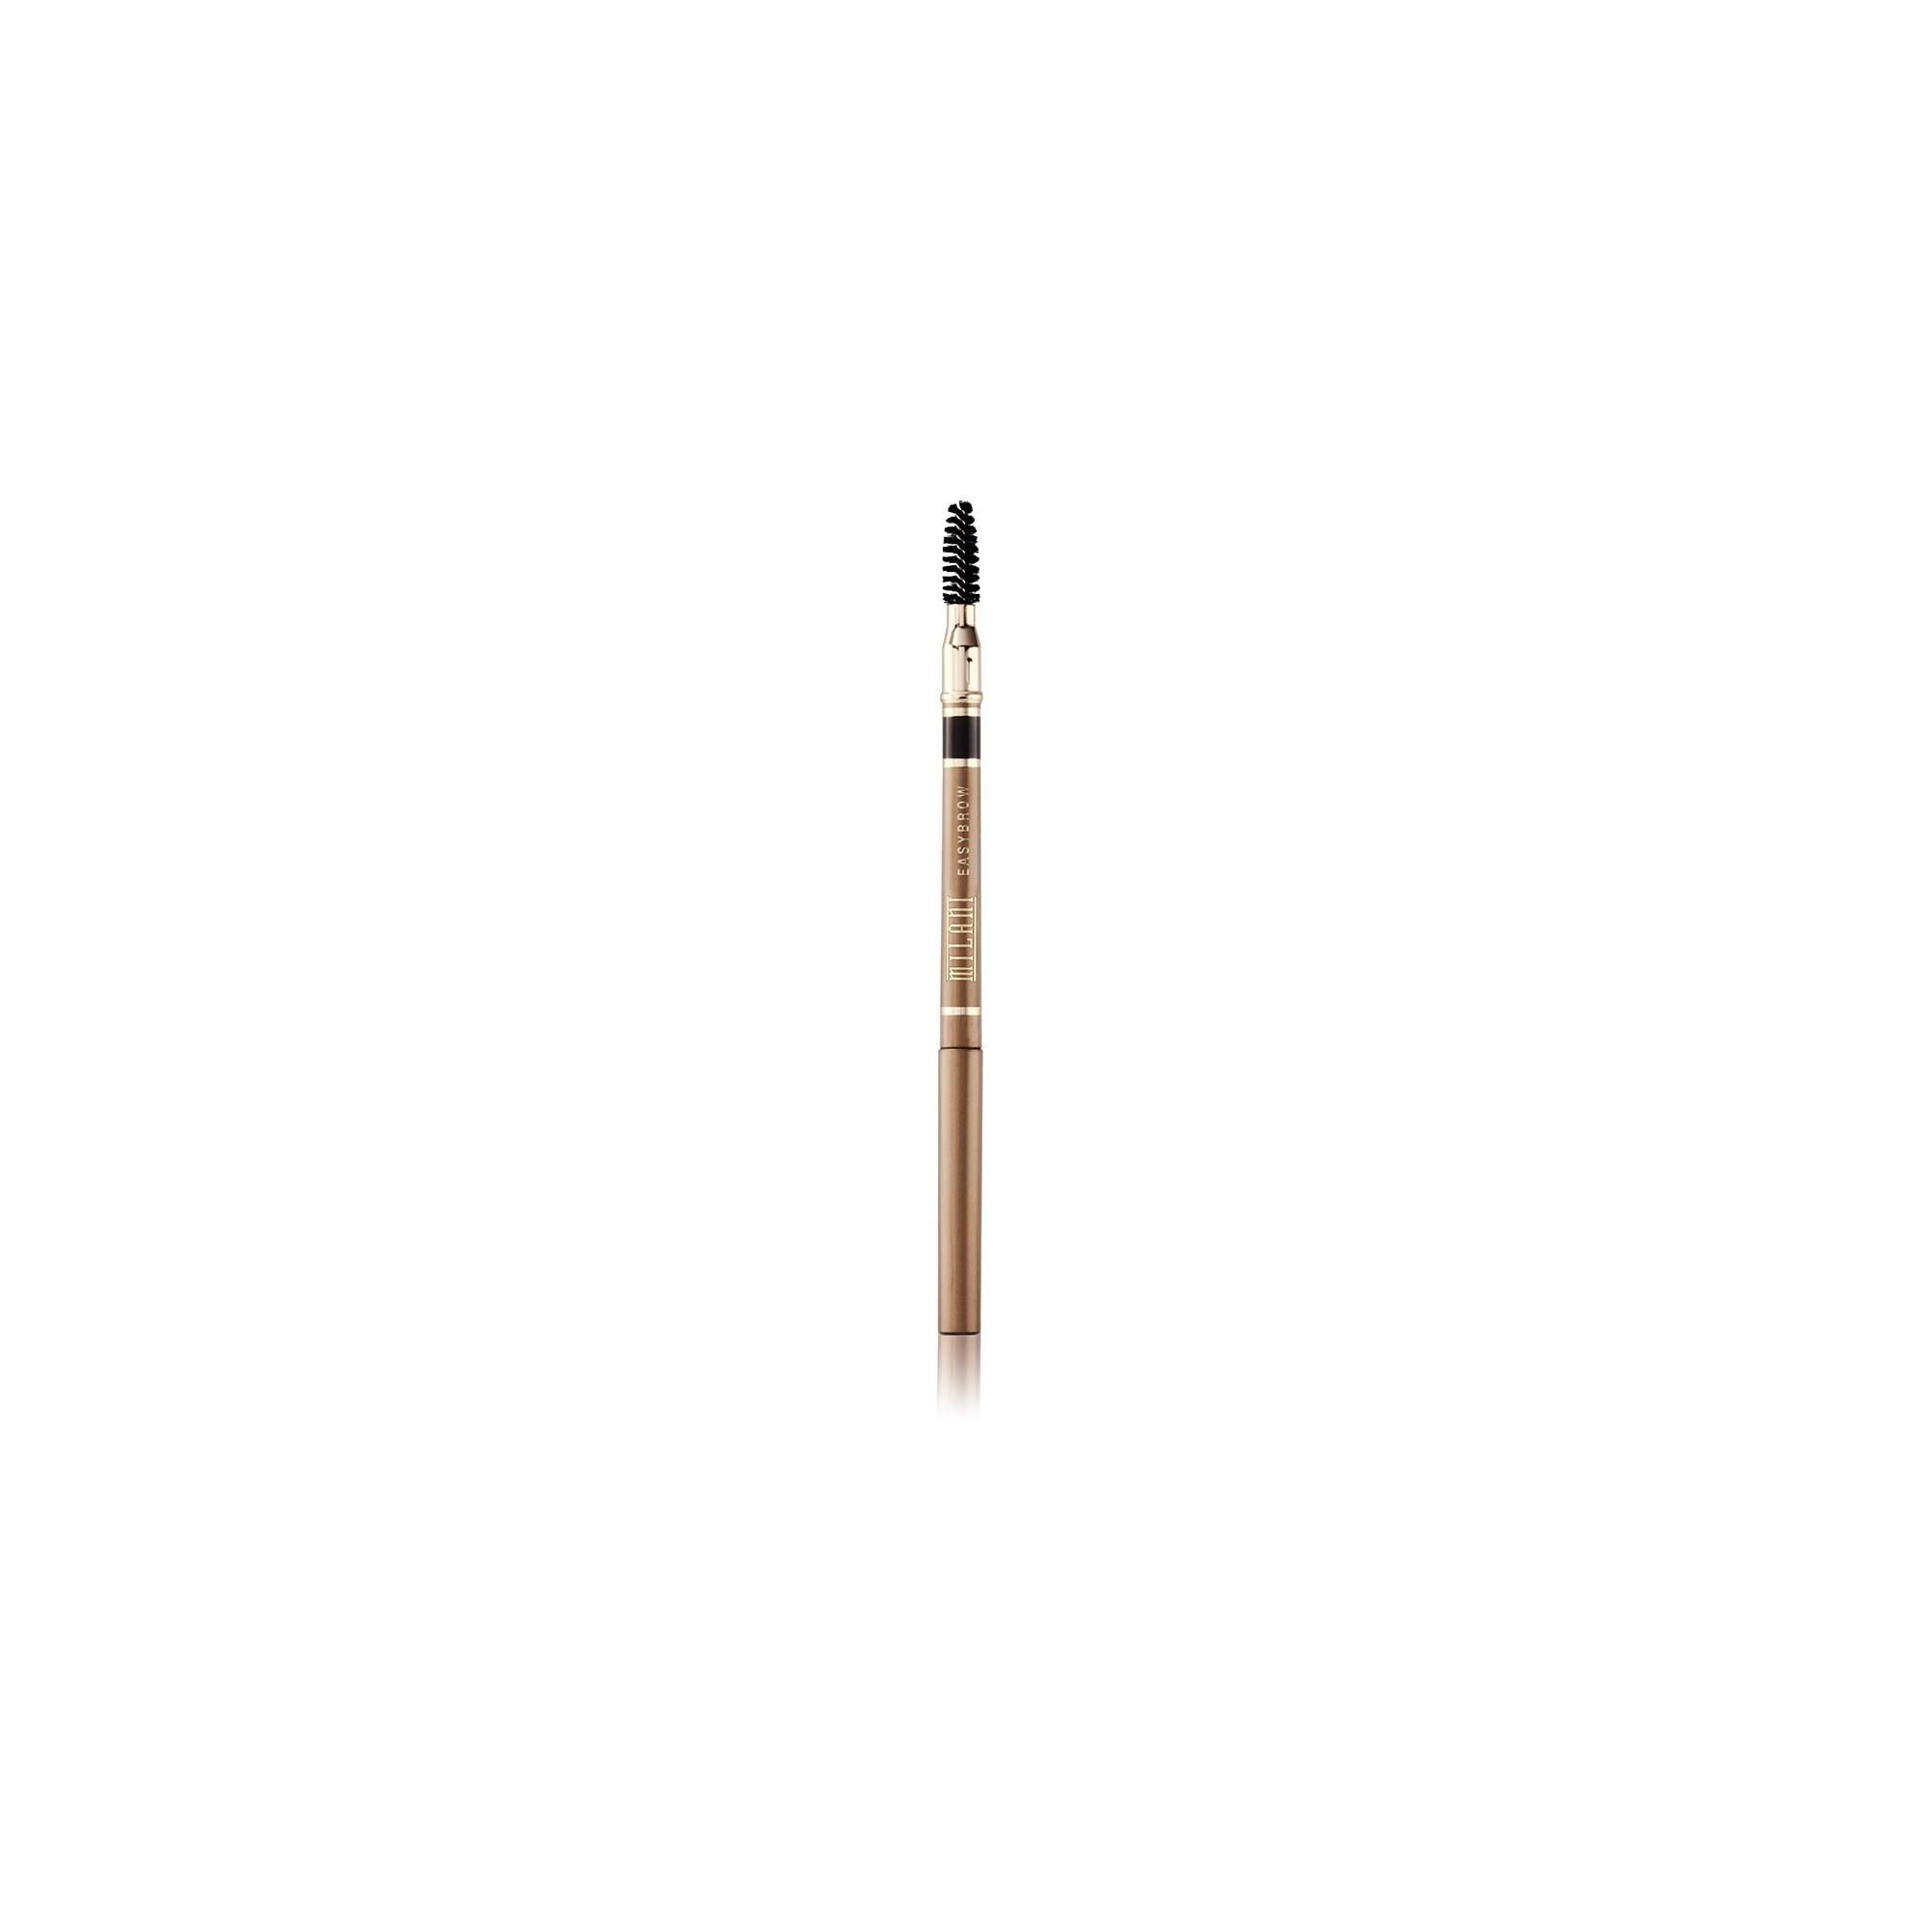 Milani Easybrow Automatic Pencil Dark Brown